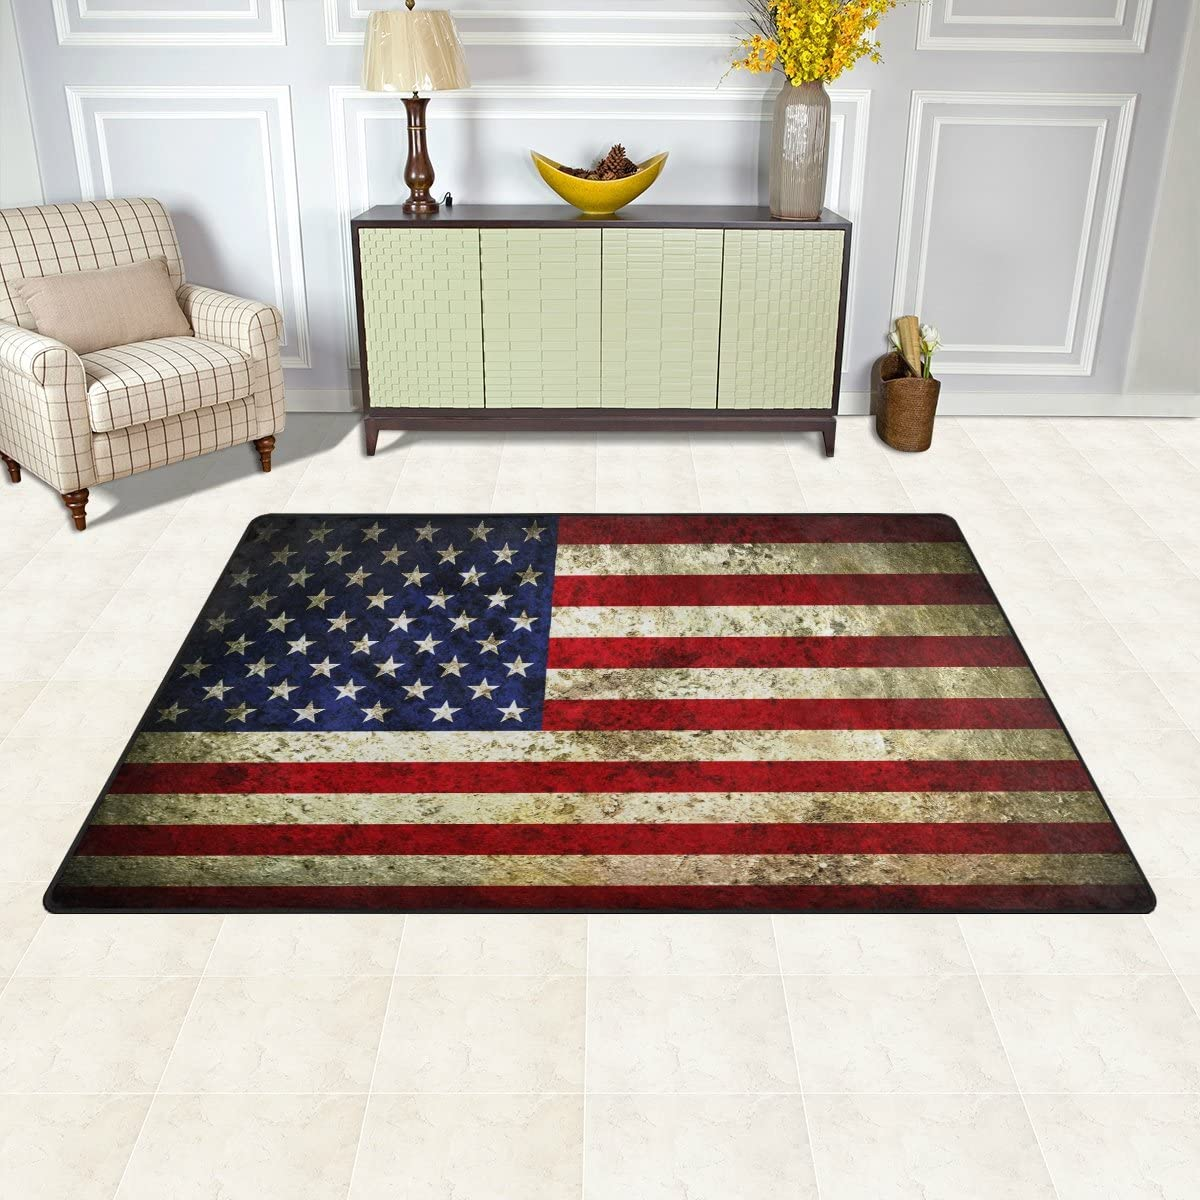 150 x 200 cm 5 x 7 ft Naanle Vintage Retro American Flag Non Slip Area Rug for Living Dinning Room Bedroom Kitchen USA Flag Star and Stripe Nursery Rug Floor Carpet Yoga Mat